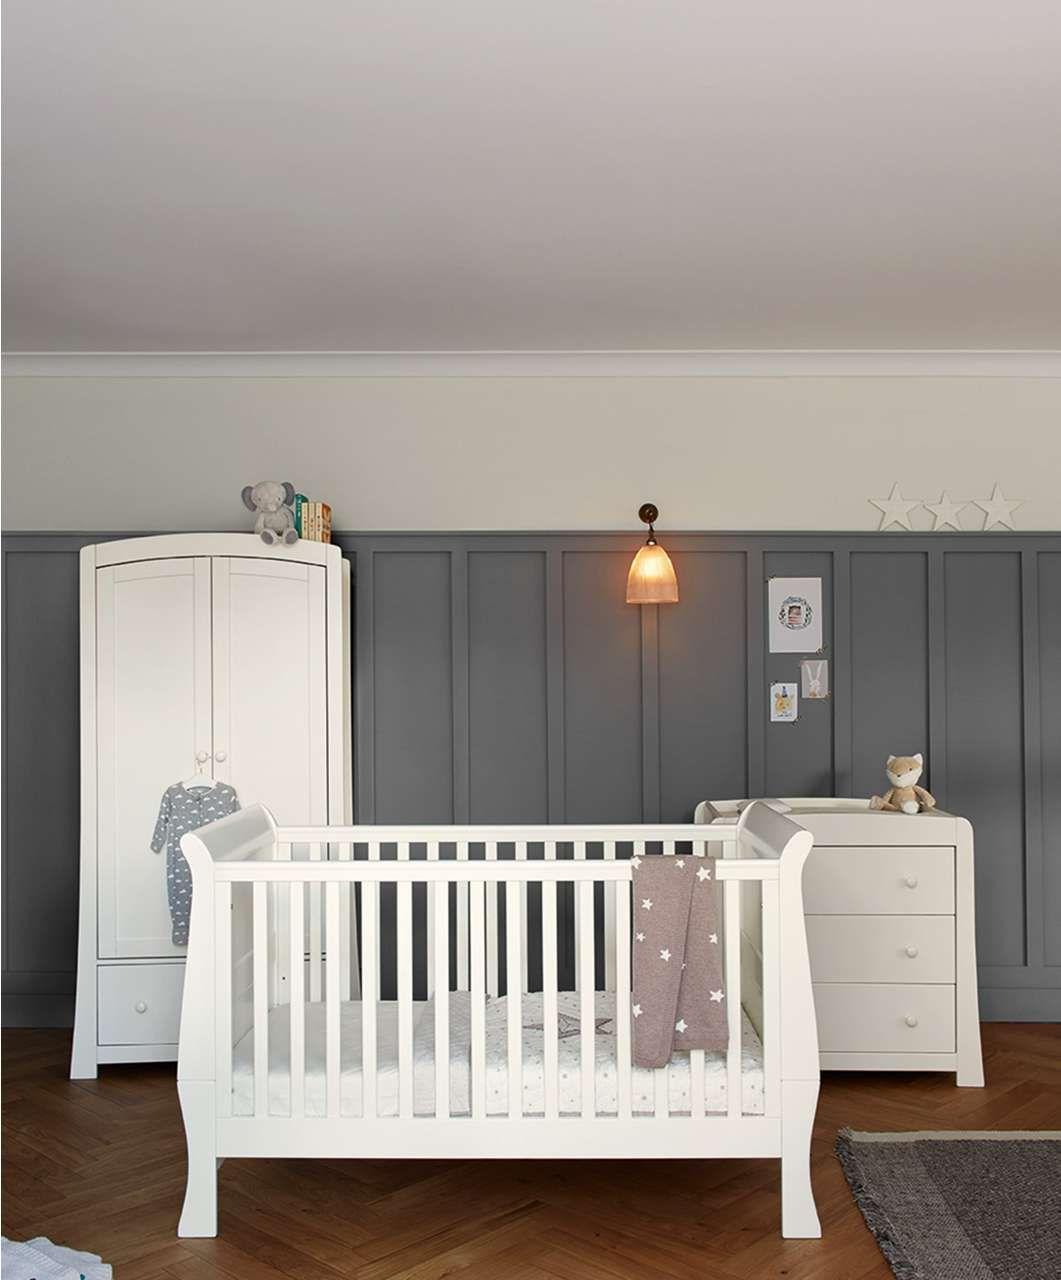 swing chair mamas and papas modern dinning chairs mia 3 piece set ivory nursery furniture